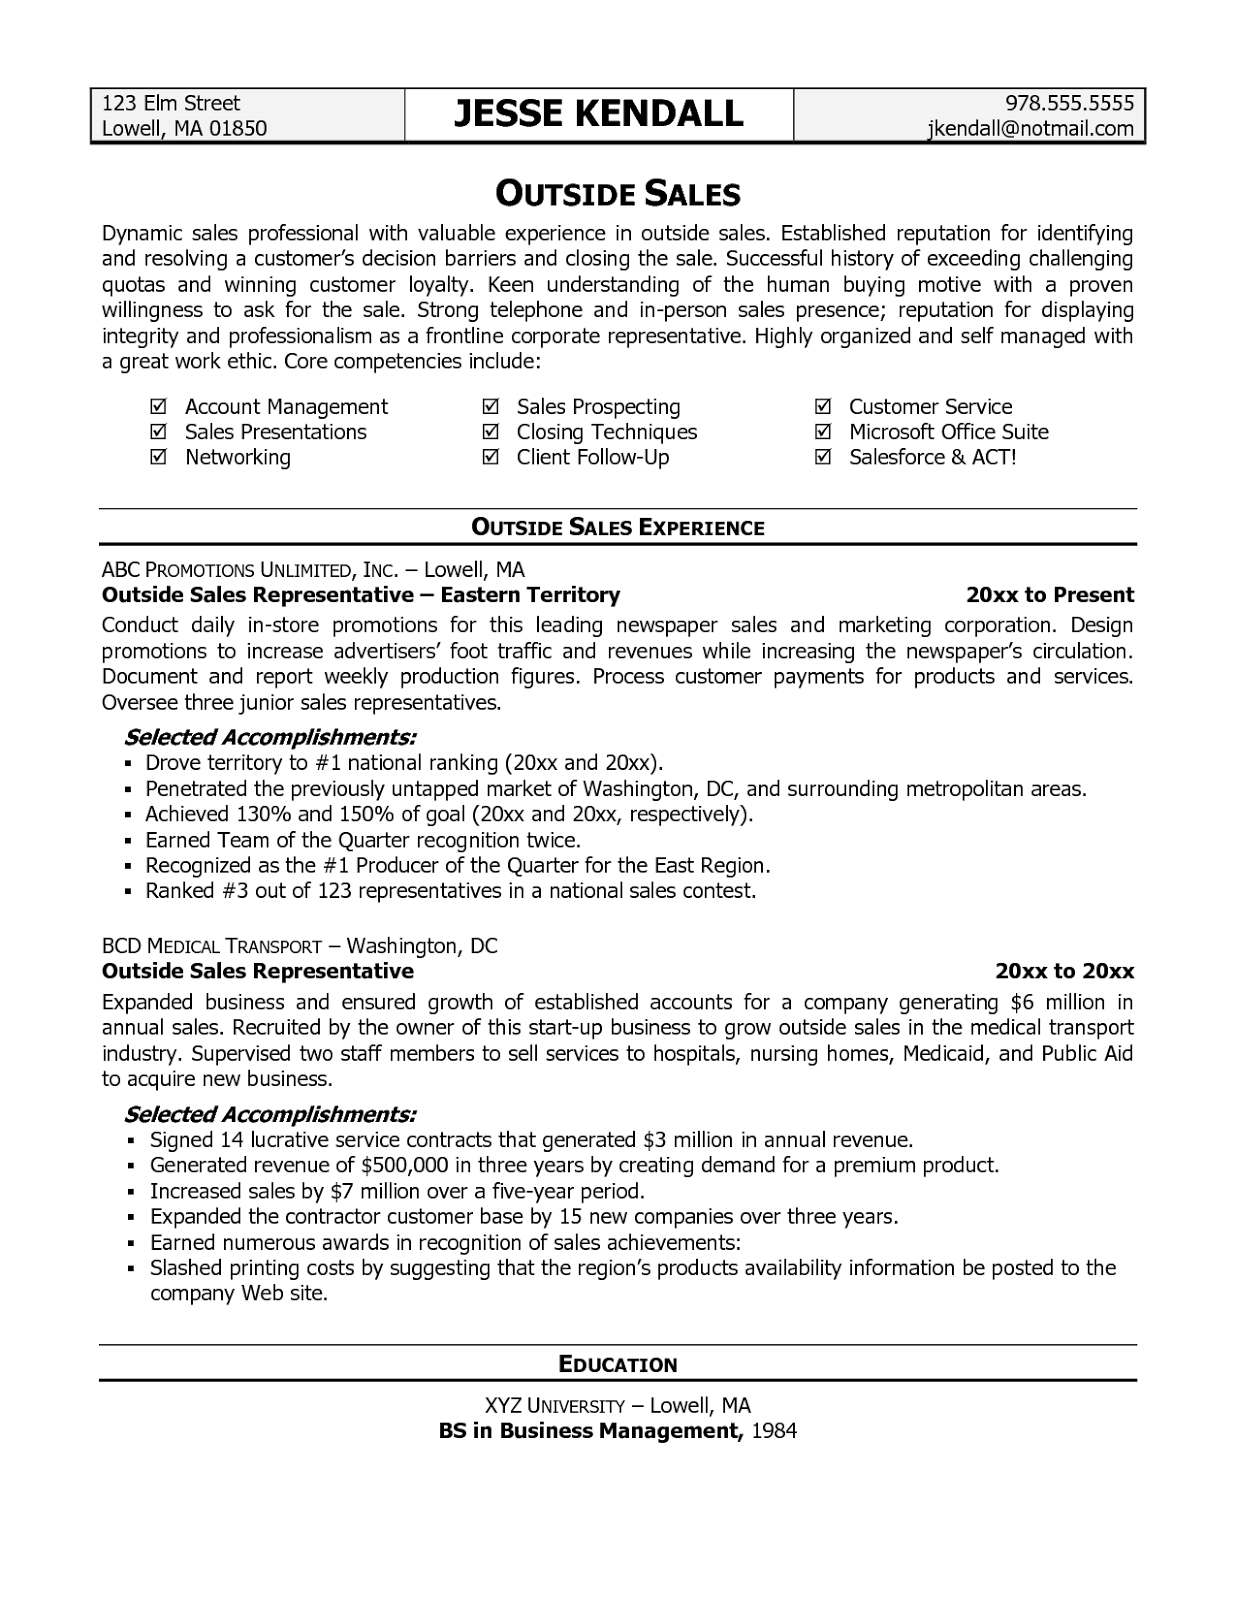 sample sales resumes concrete sales resume sample sales resume myperfectresume com sample resume inside sales rep